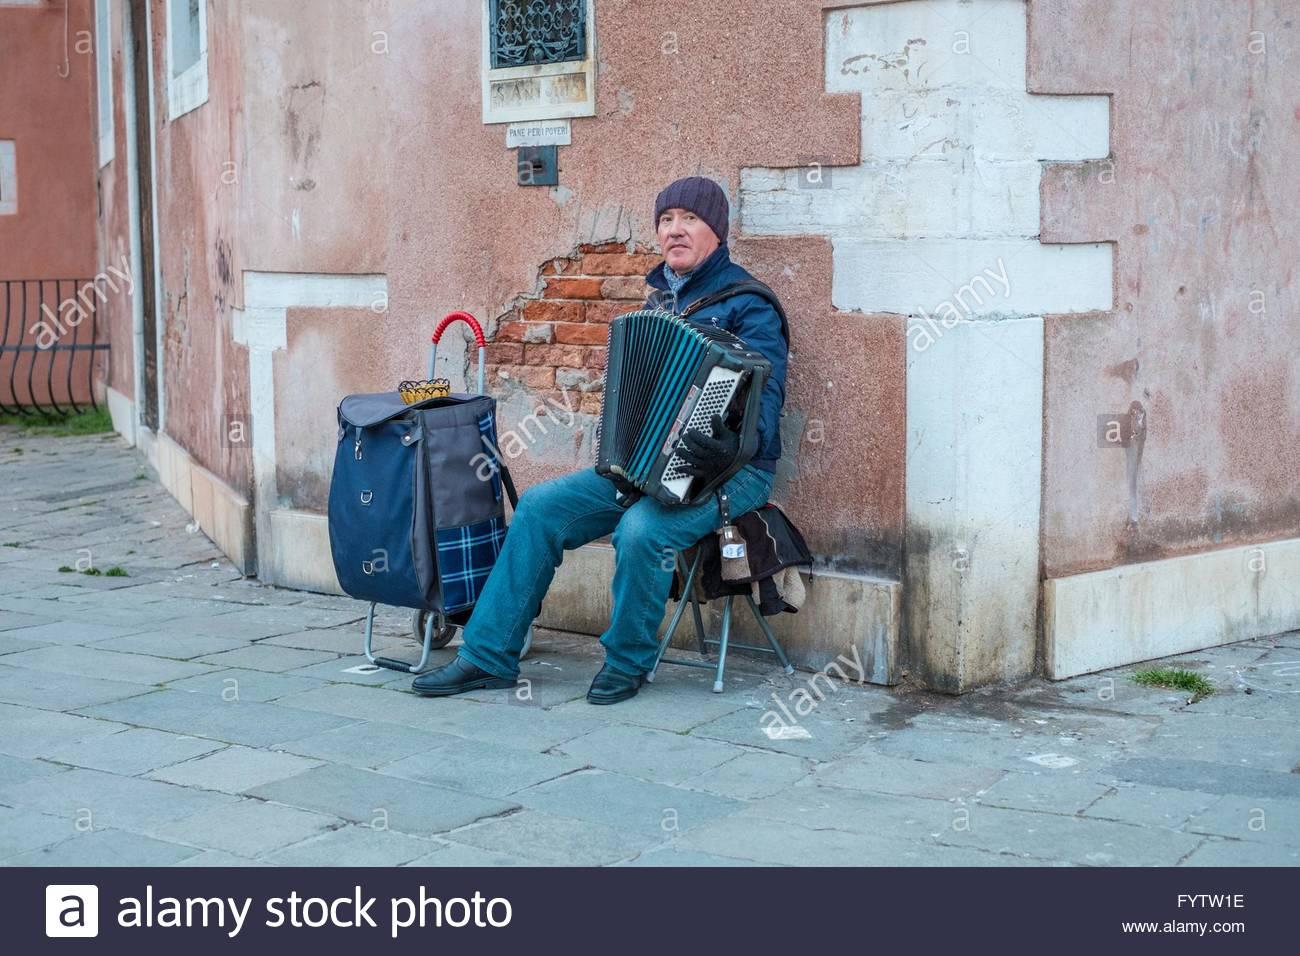 Musicien de rue, Venise Italie. Photo Stock